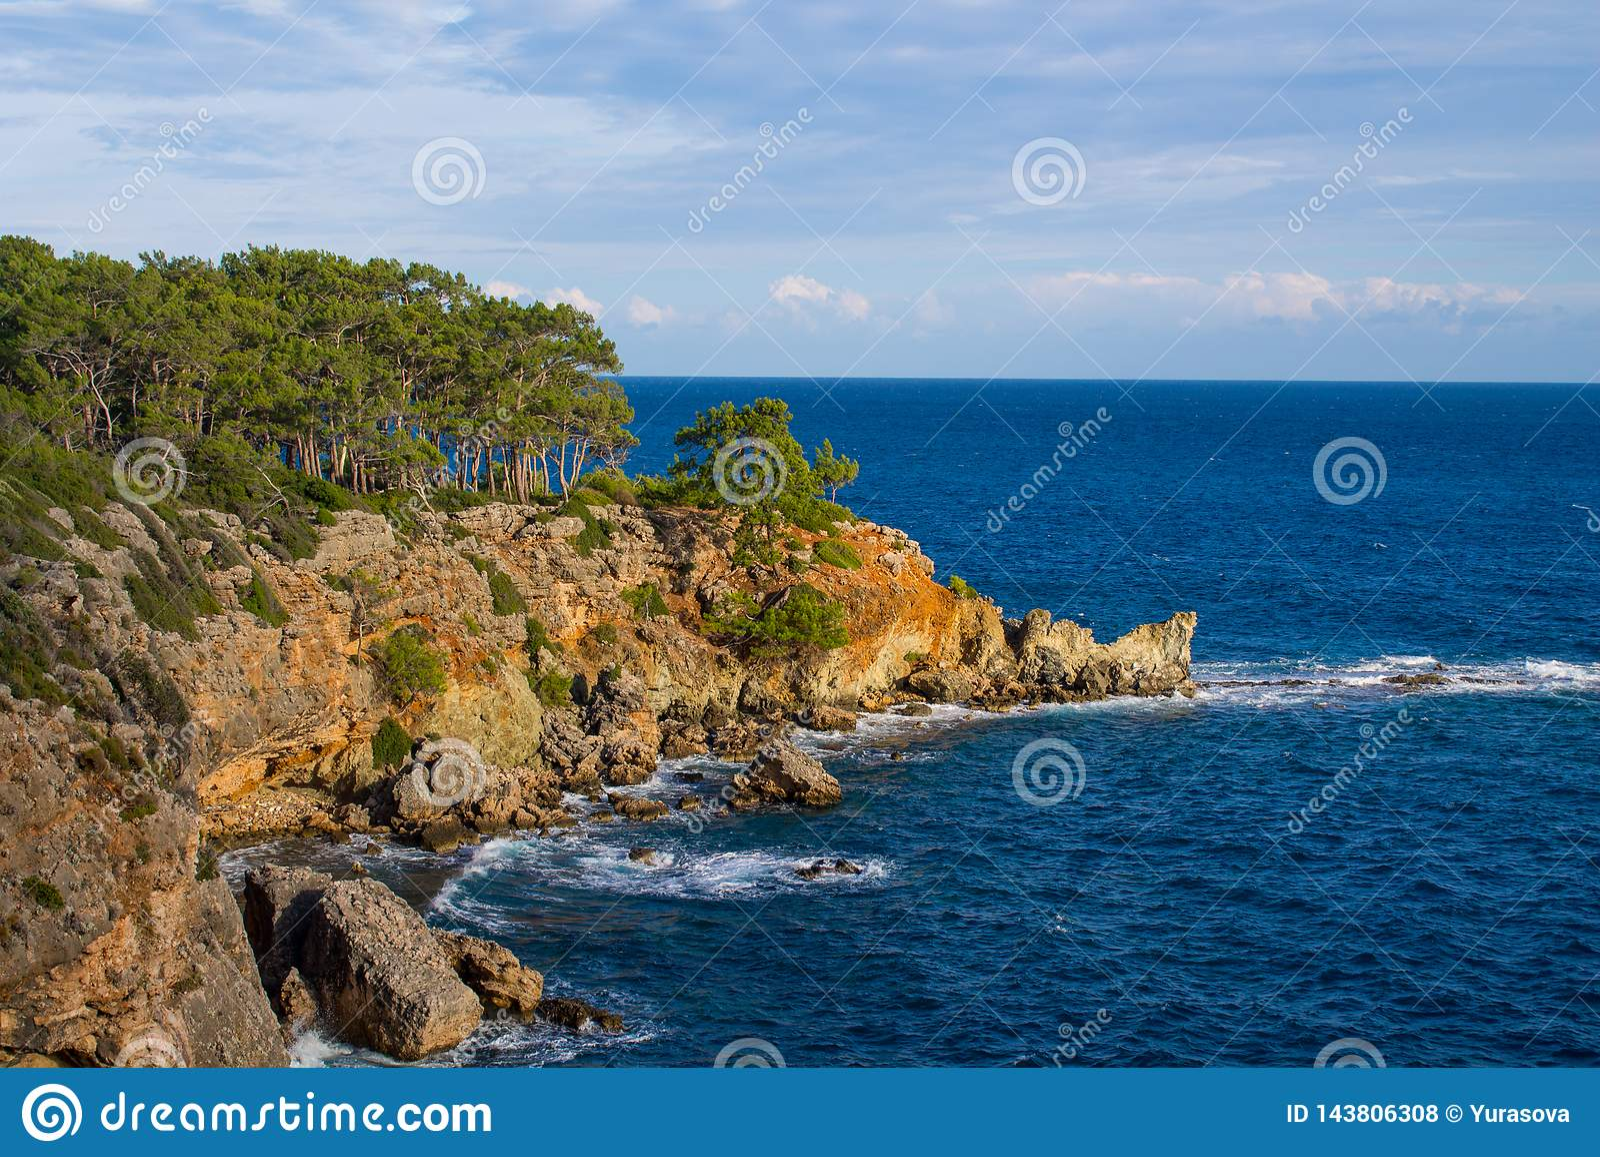 Mooie rotsachtige steile kust en grote golven